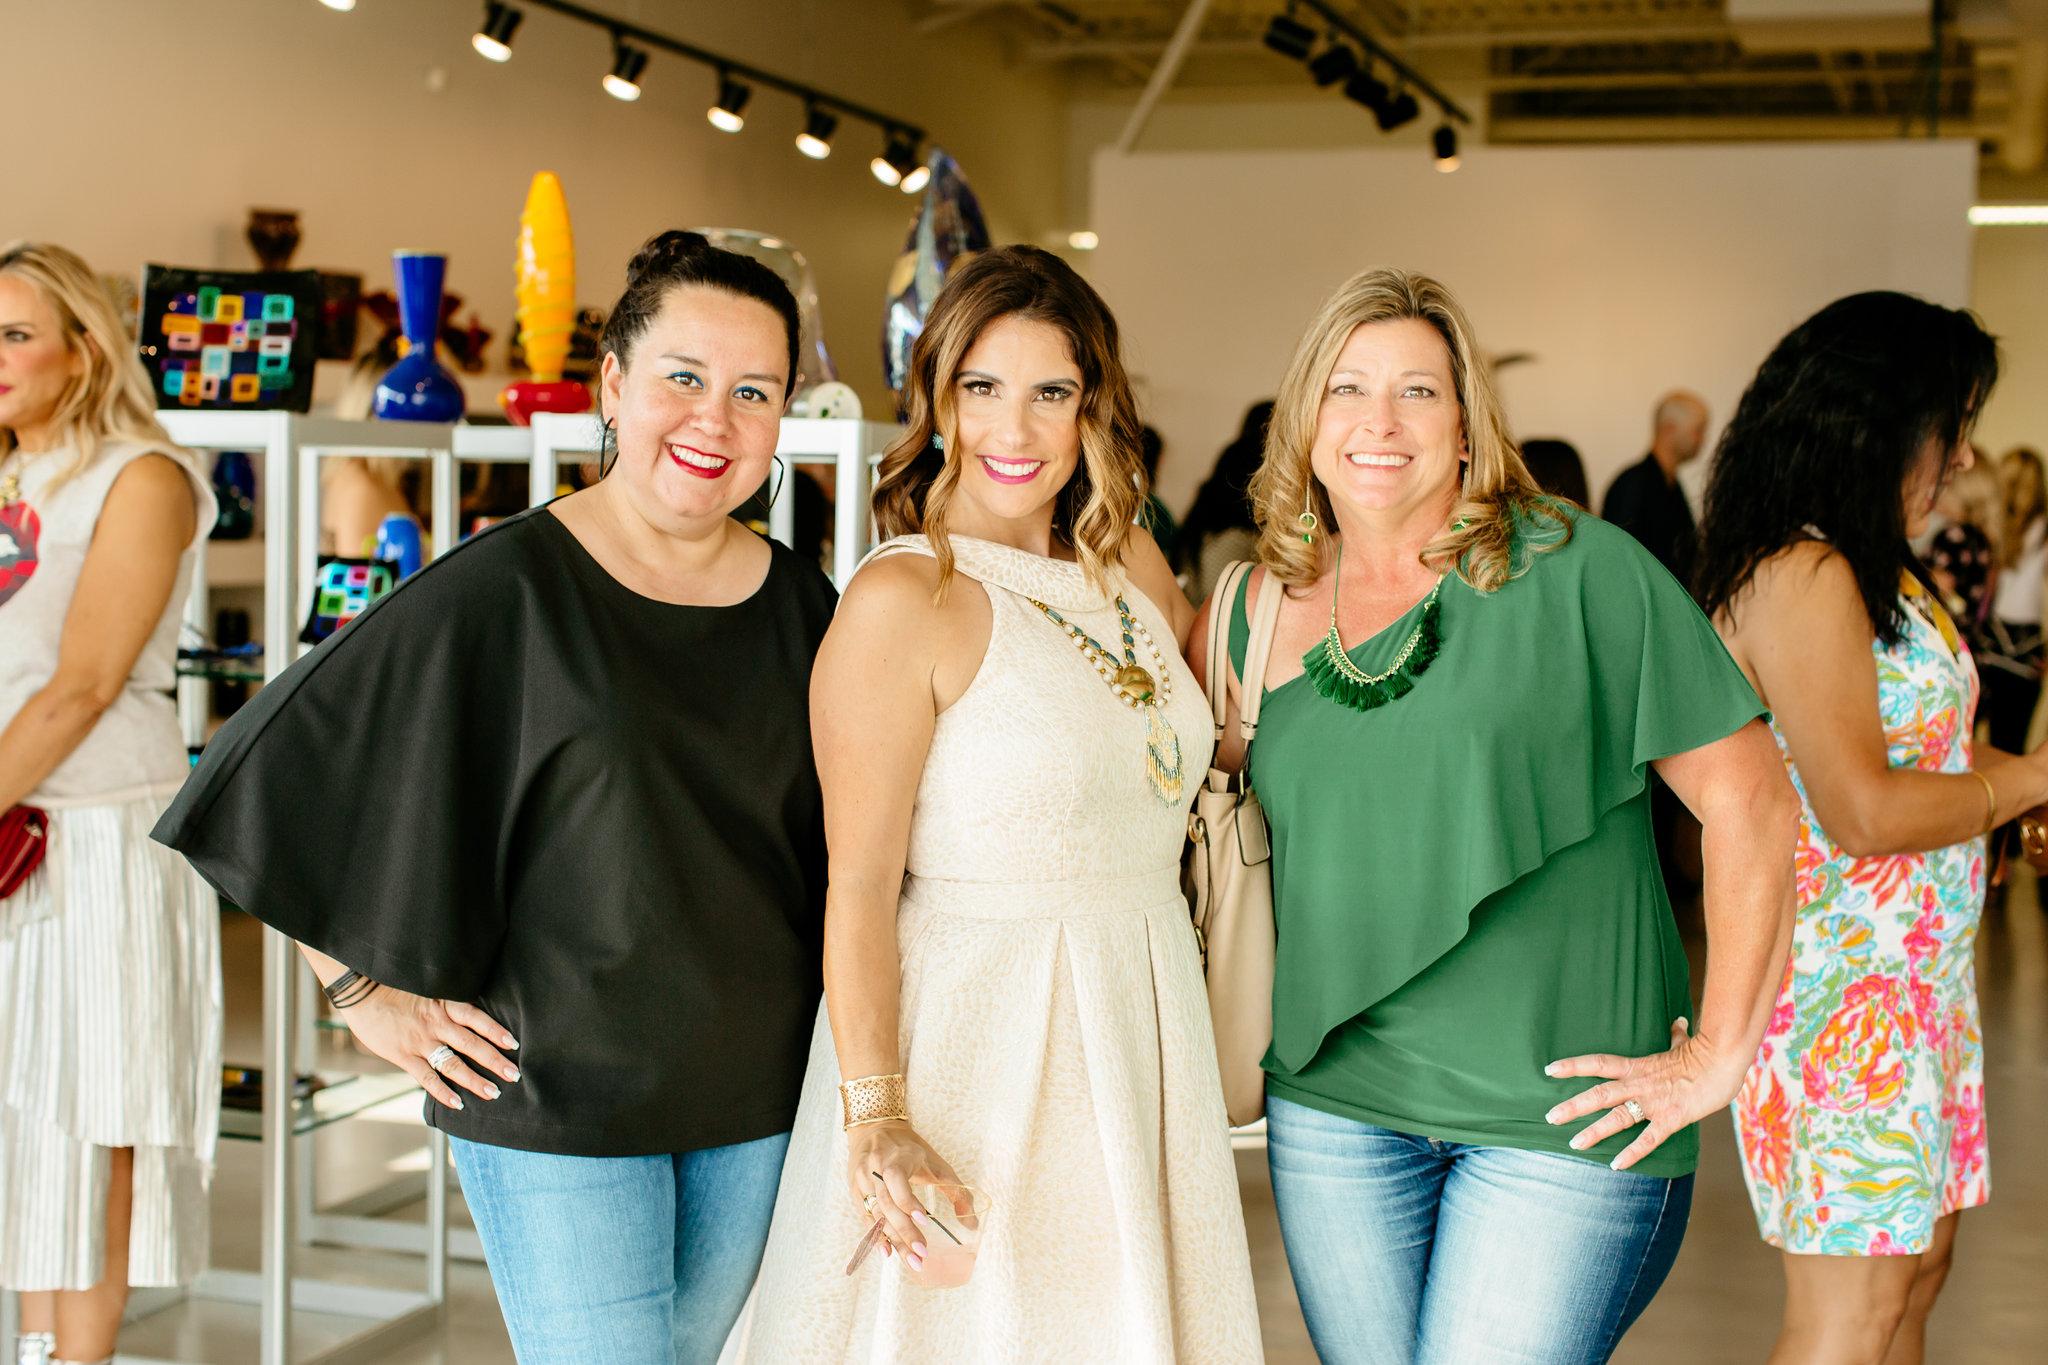 Alexa-Vossler-Photo_Dallas-Event-Photographer_Brite-Bar-Beauty-2018-Lipstick-Launch-Party-81.jpg